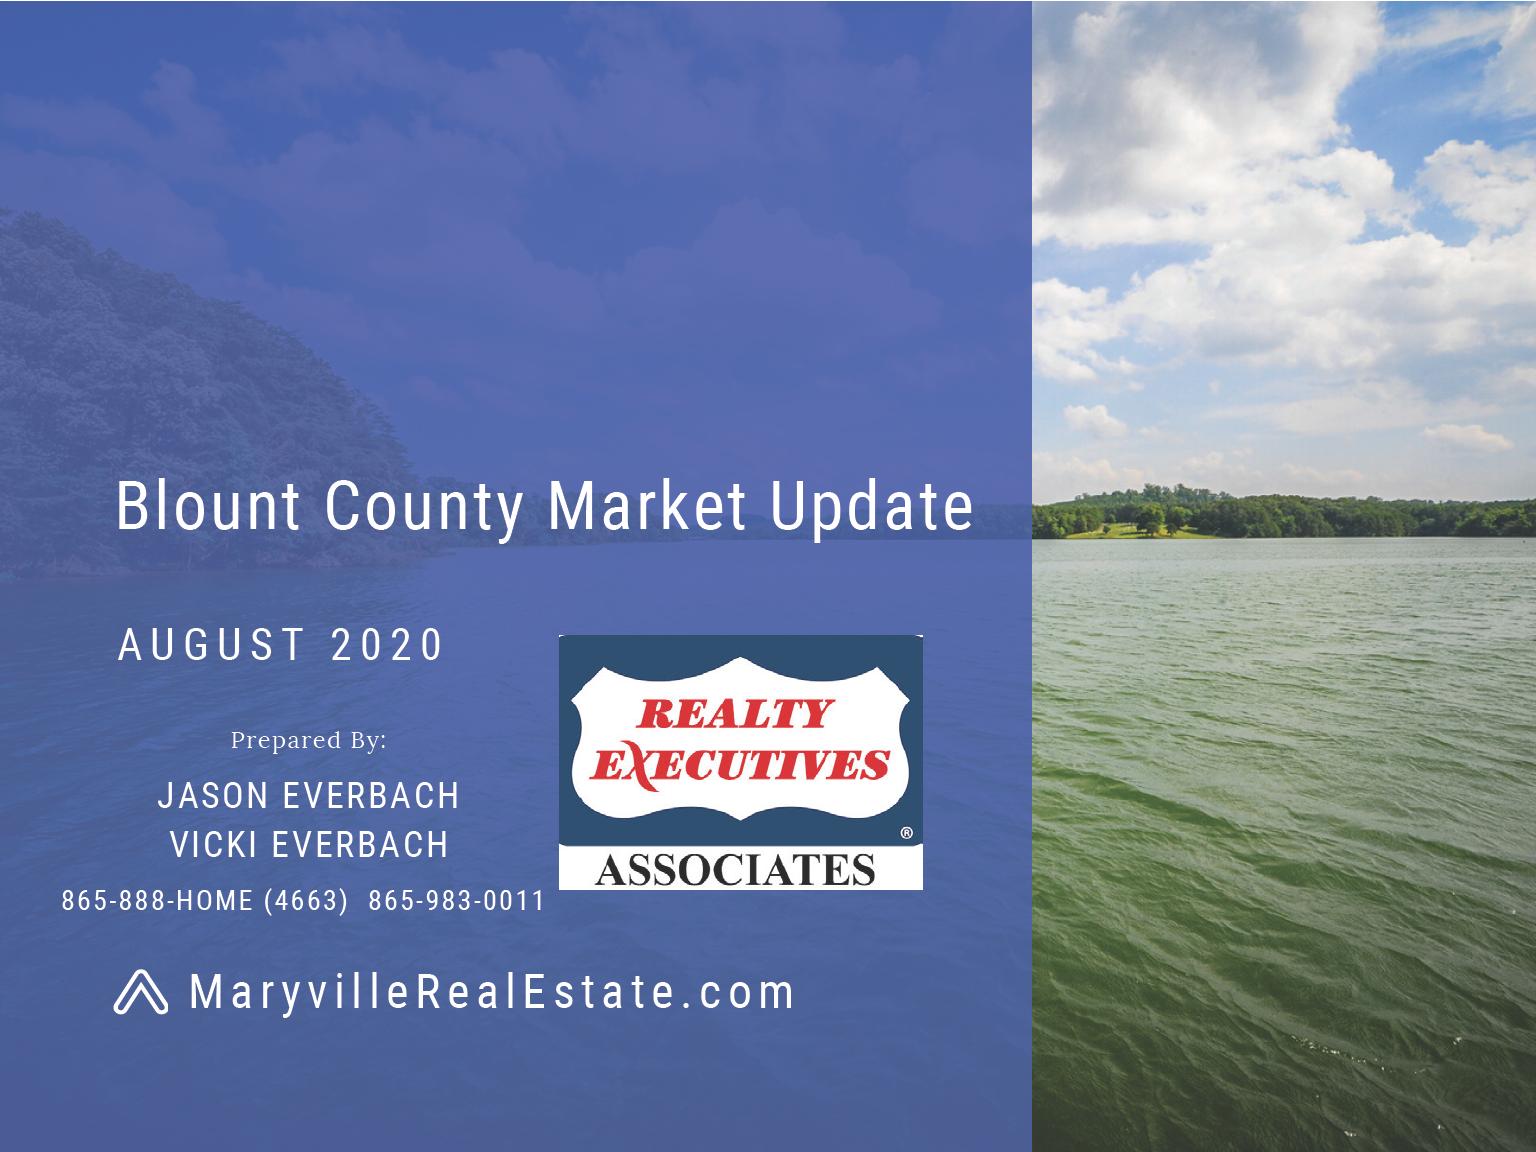 August 2020 Blount County Market Update